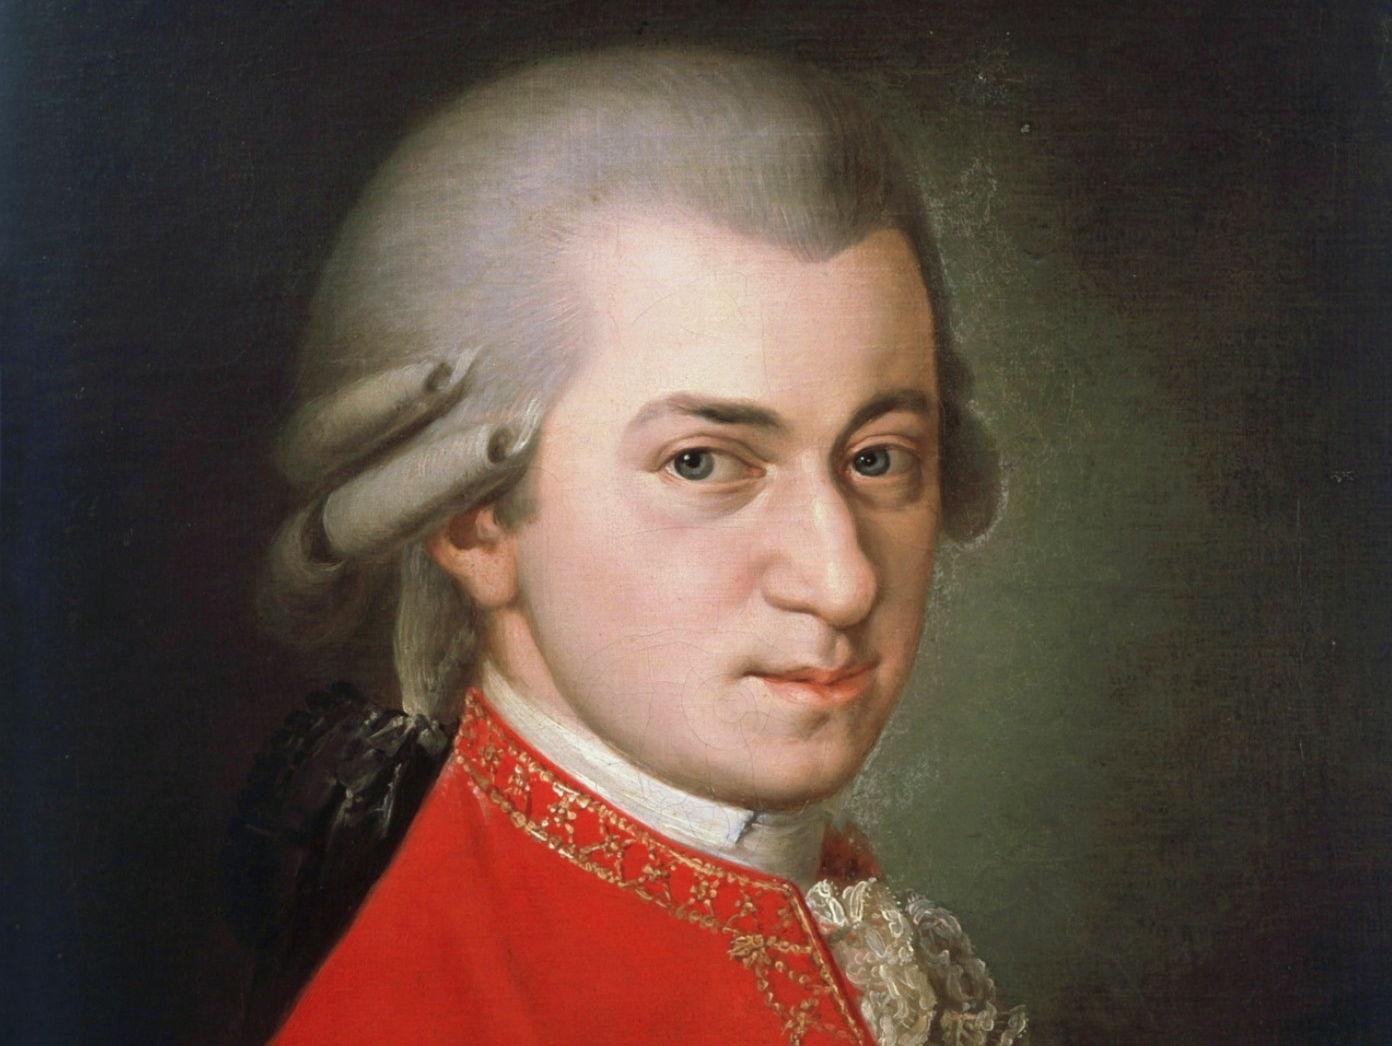 Analysis of Die Zauberflote Mozart (Pearson/Edexcel)